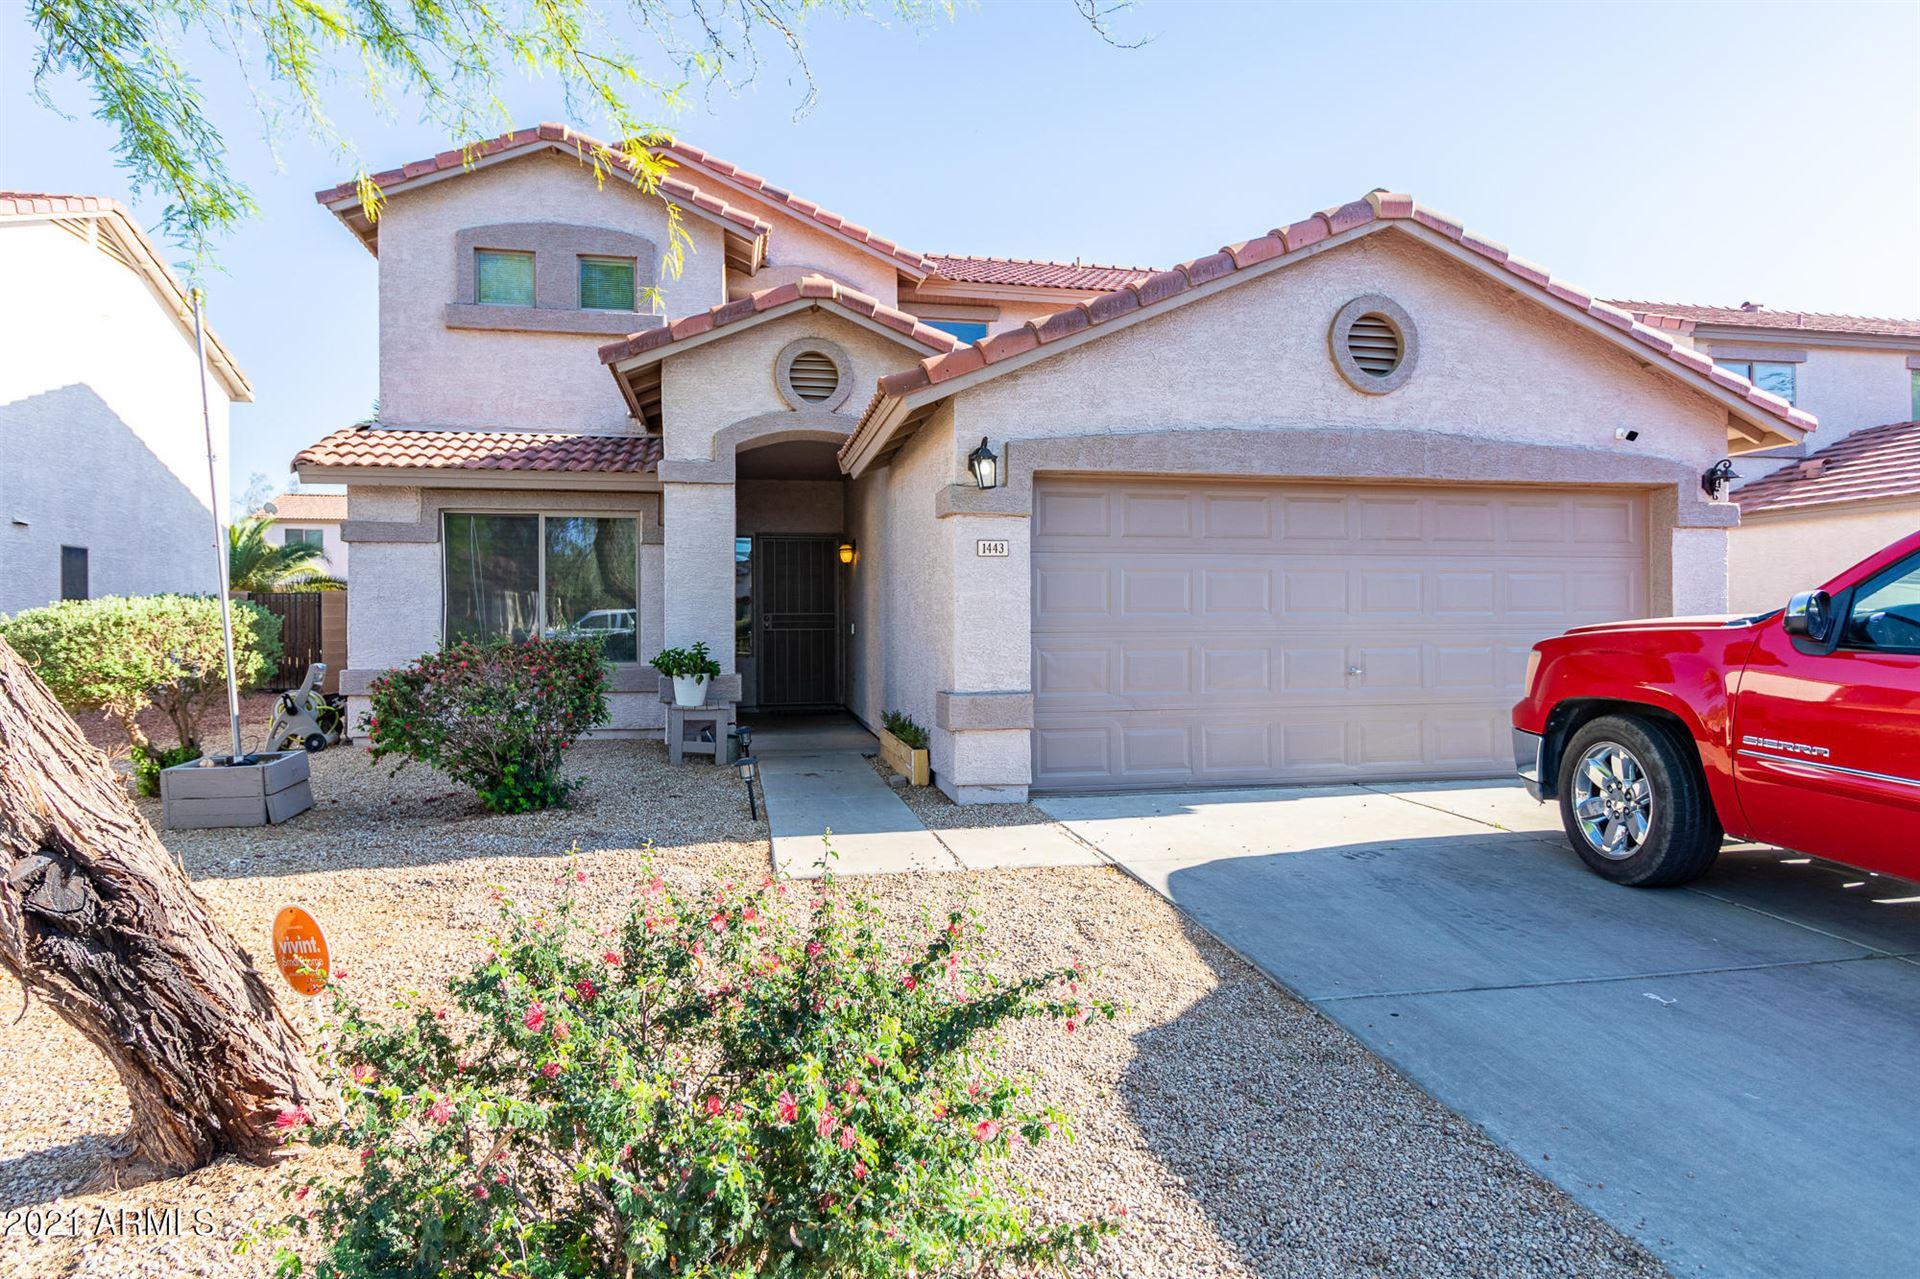 1443 E 11TH Street, Casa Grande, AZ 85122 - MLS#: 6225381